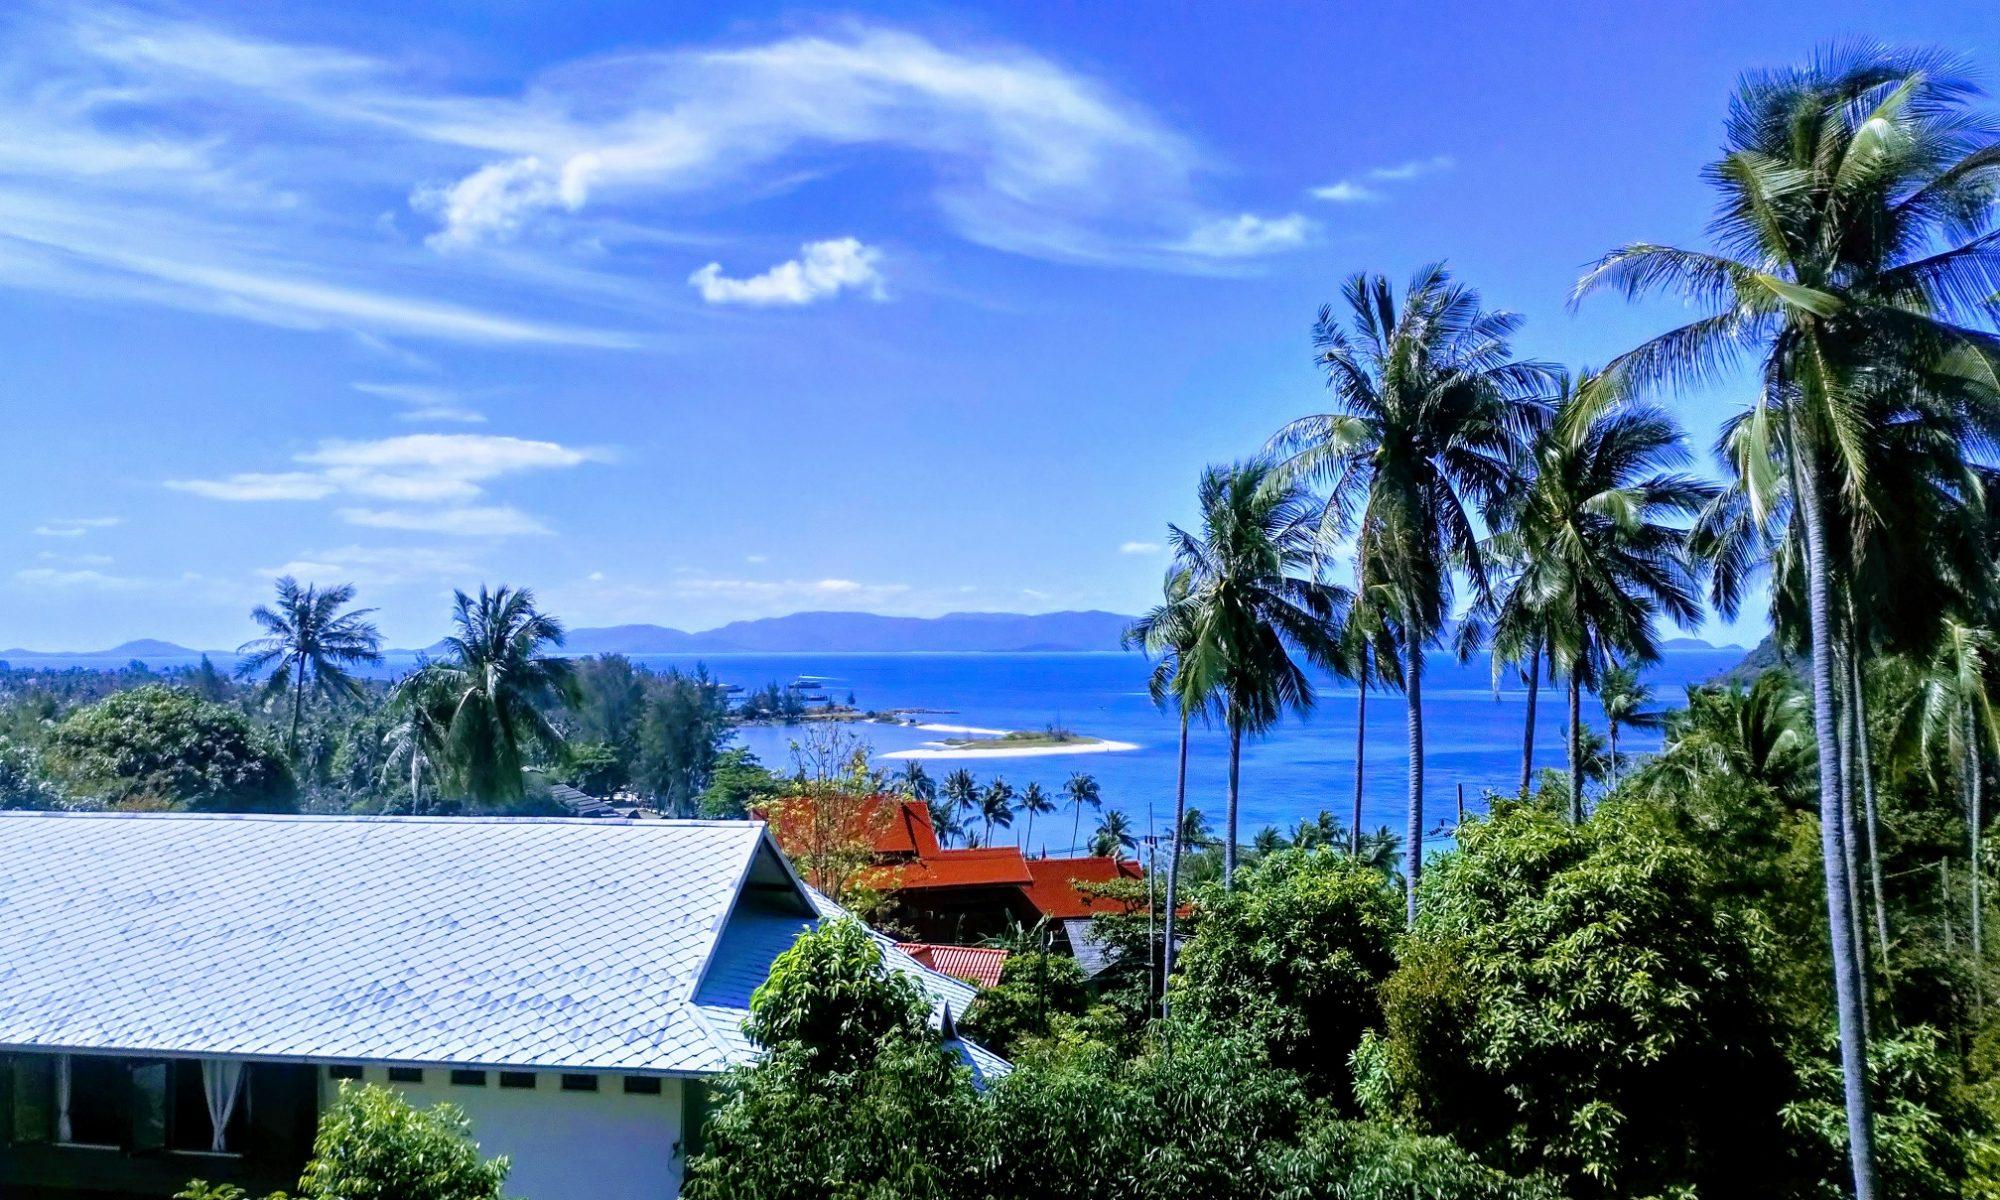 Baan Siam | 2 Bedroom House for Rent | Koh Phangan, Thailand